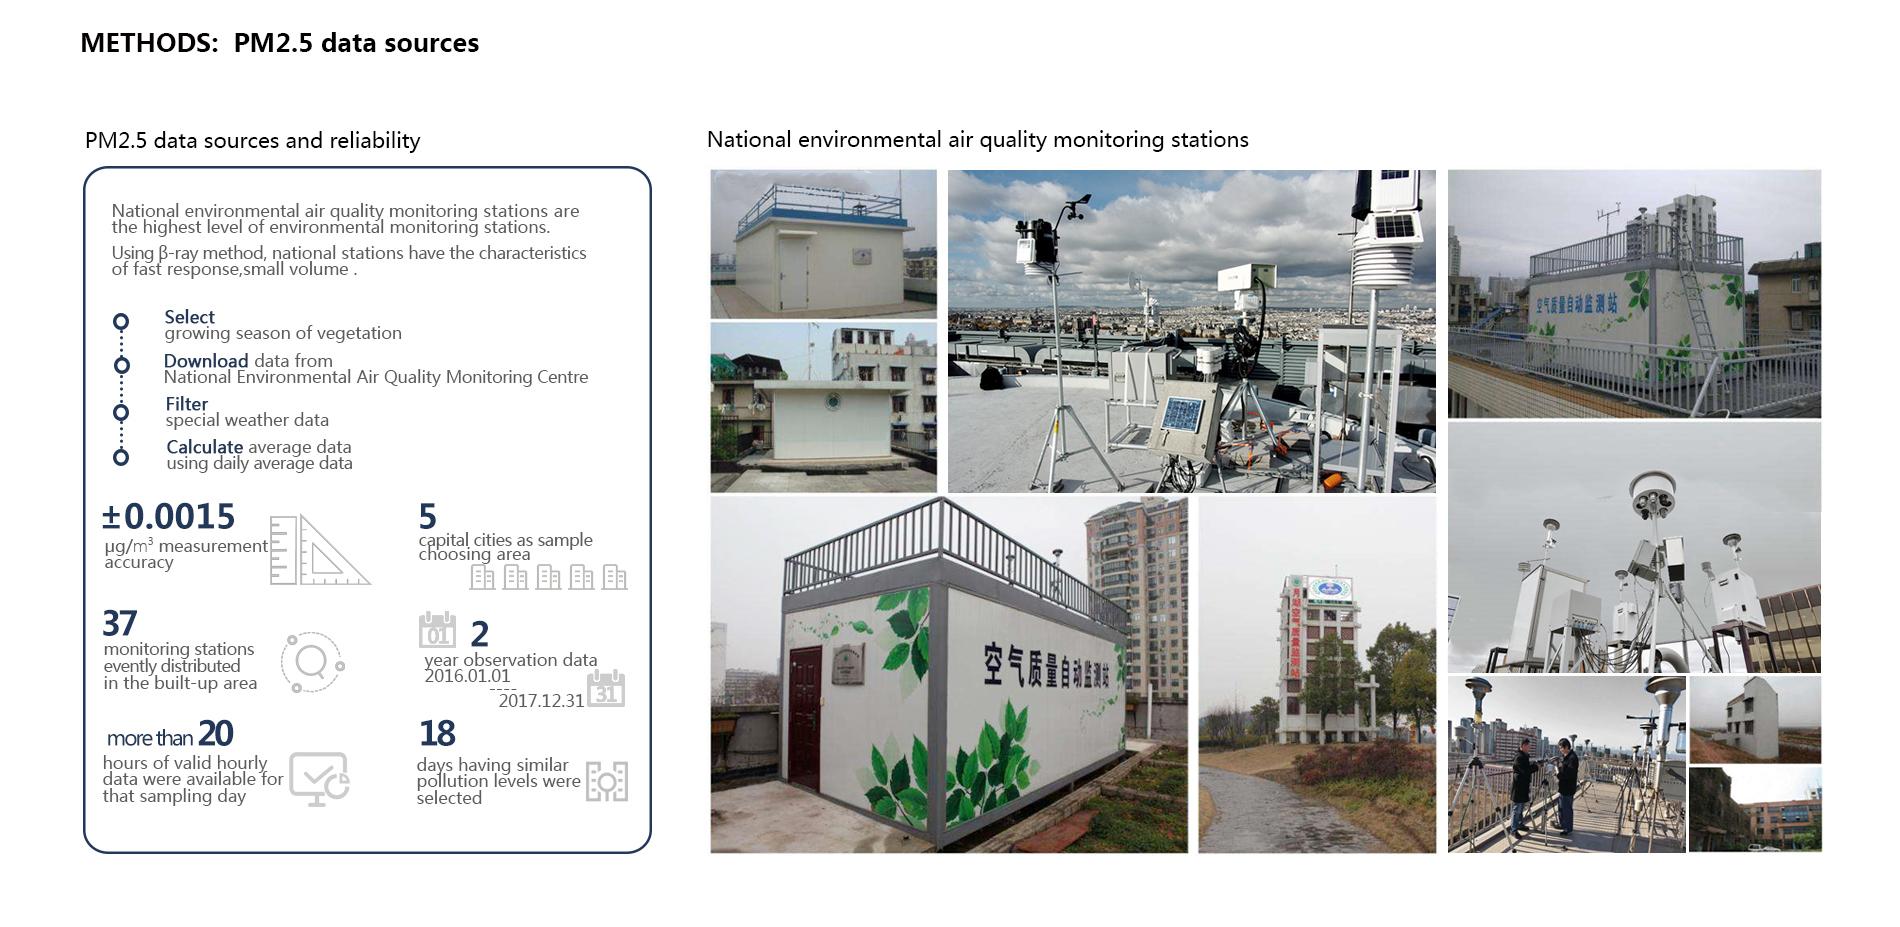 Methods: PM2.5 data source